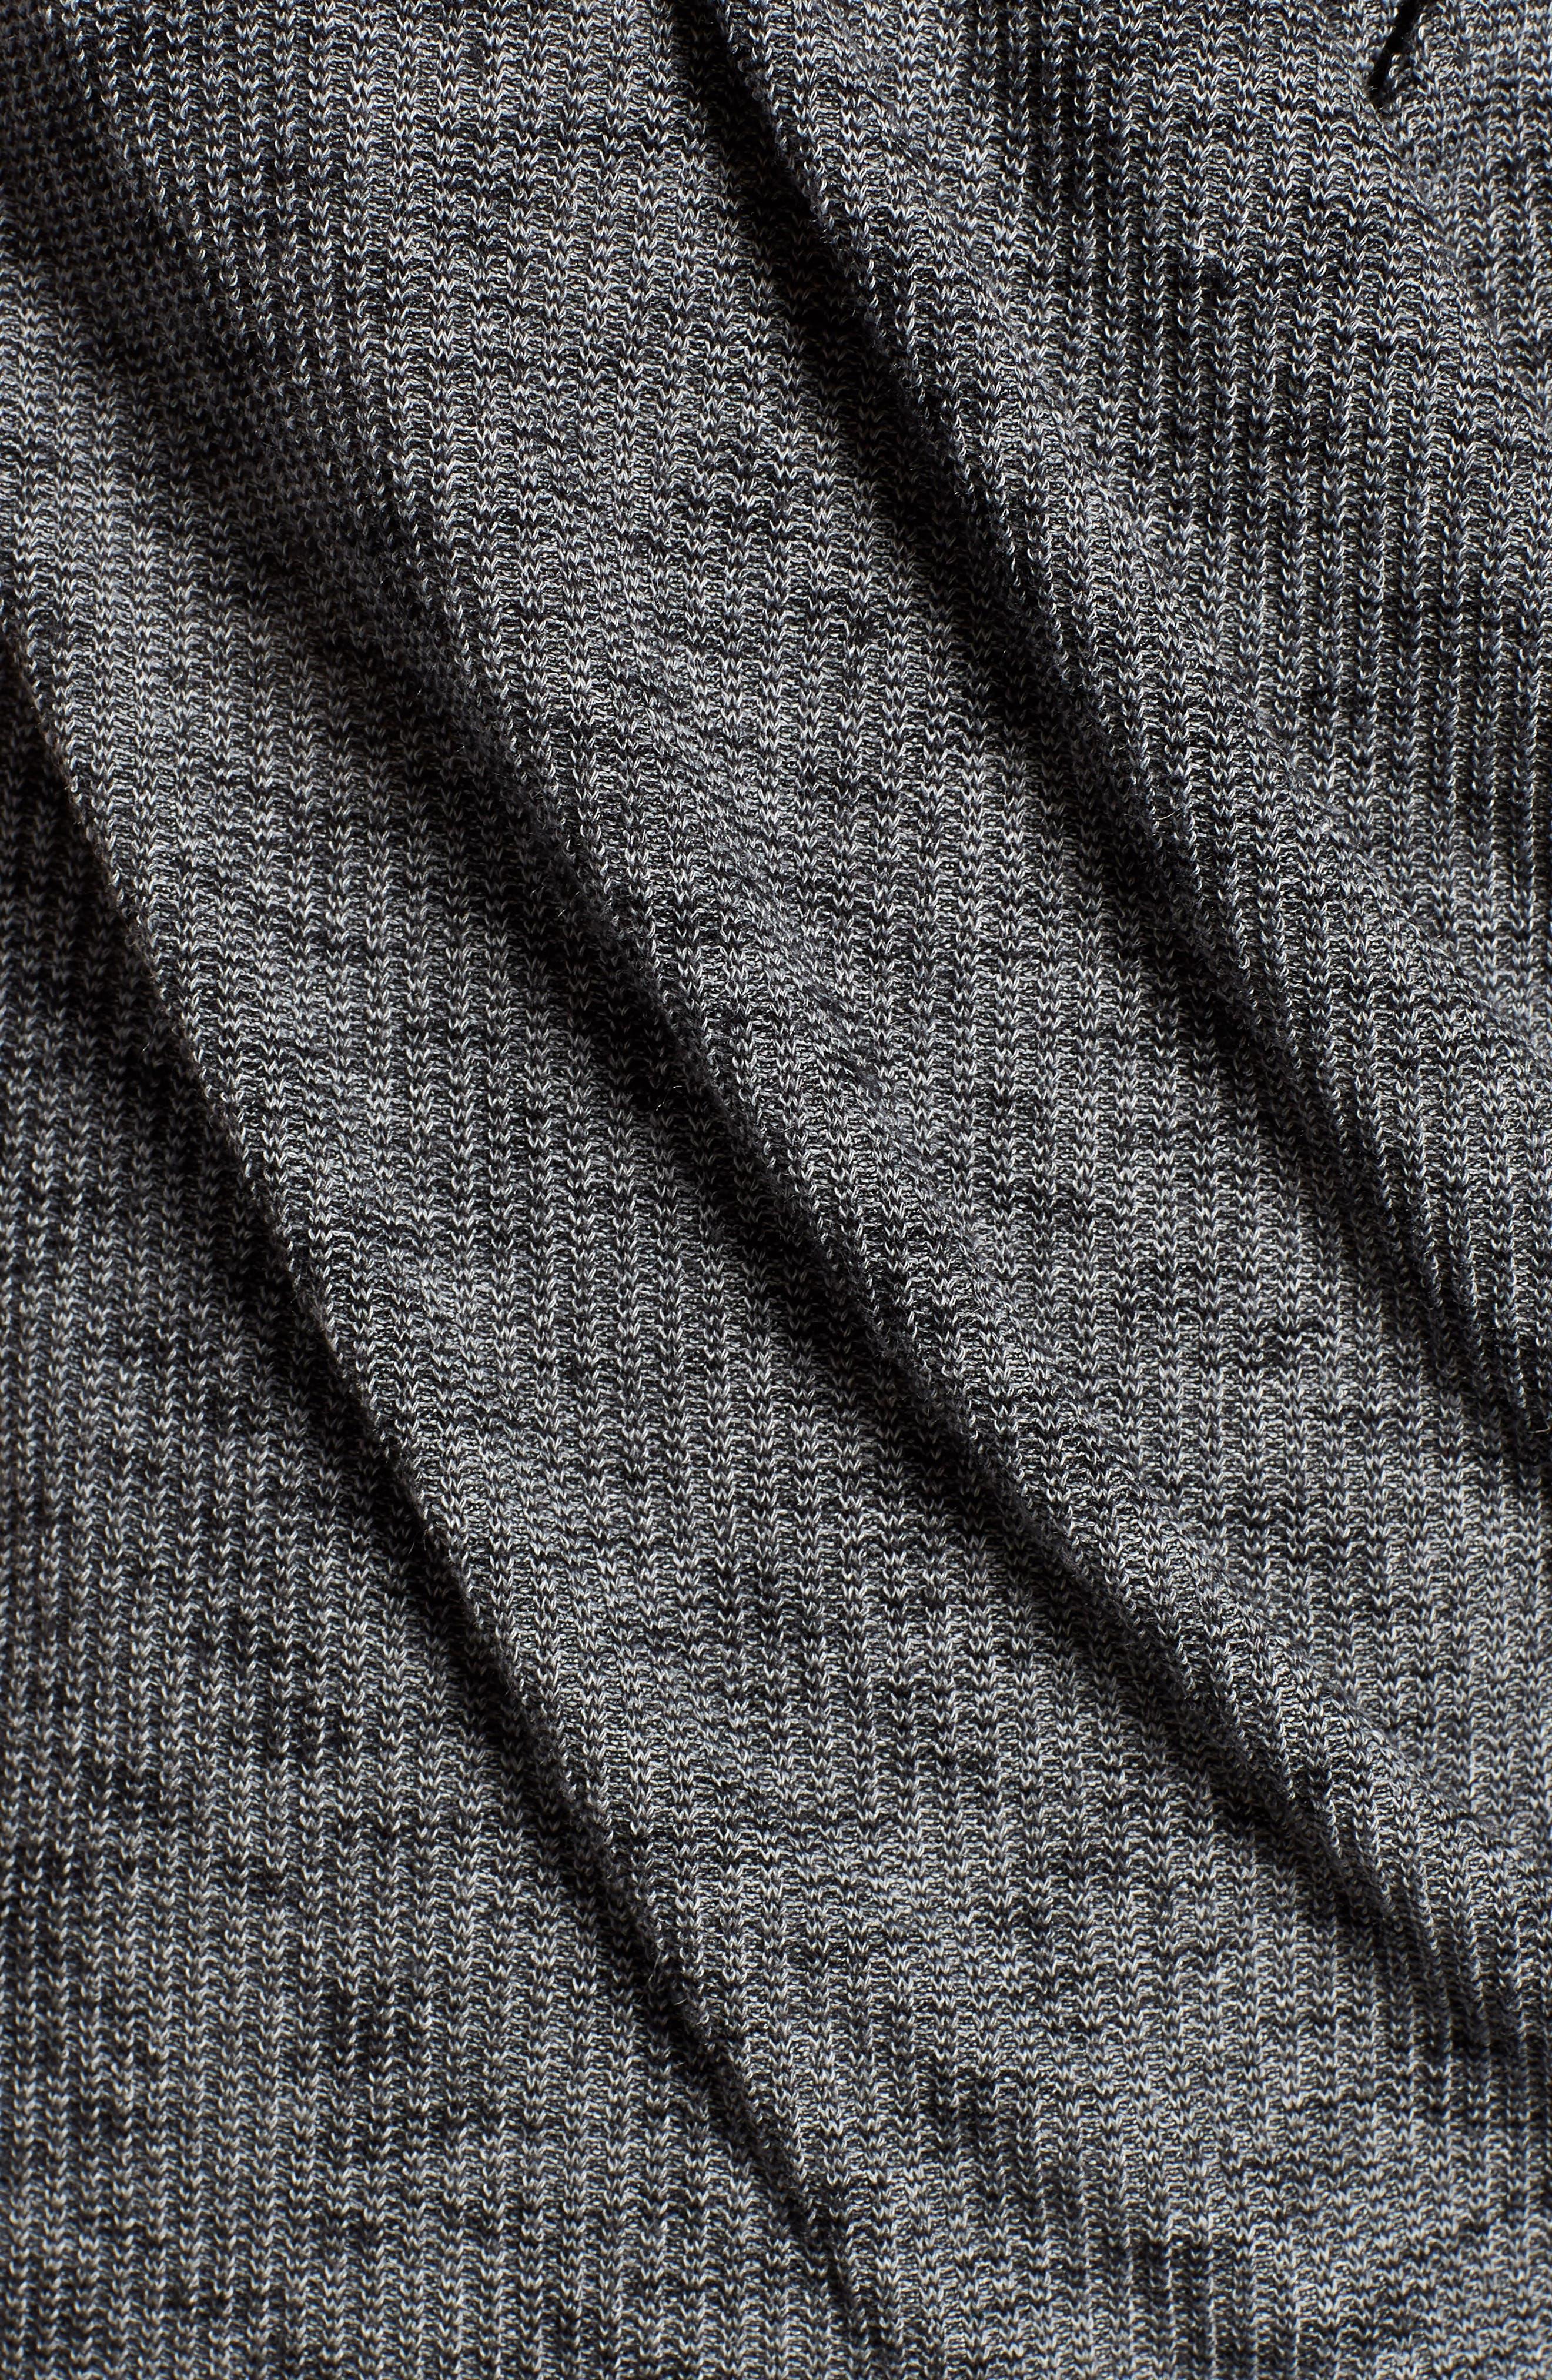 Surplus Knit Sleeveless Top,                             Alternate thumbnail 5, color,                             001